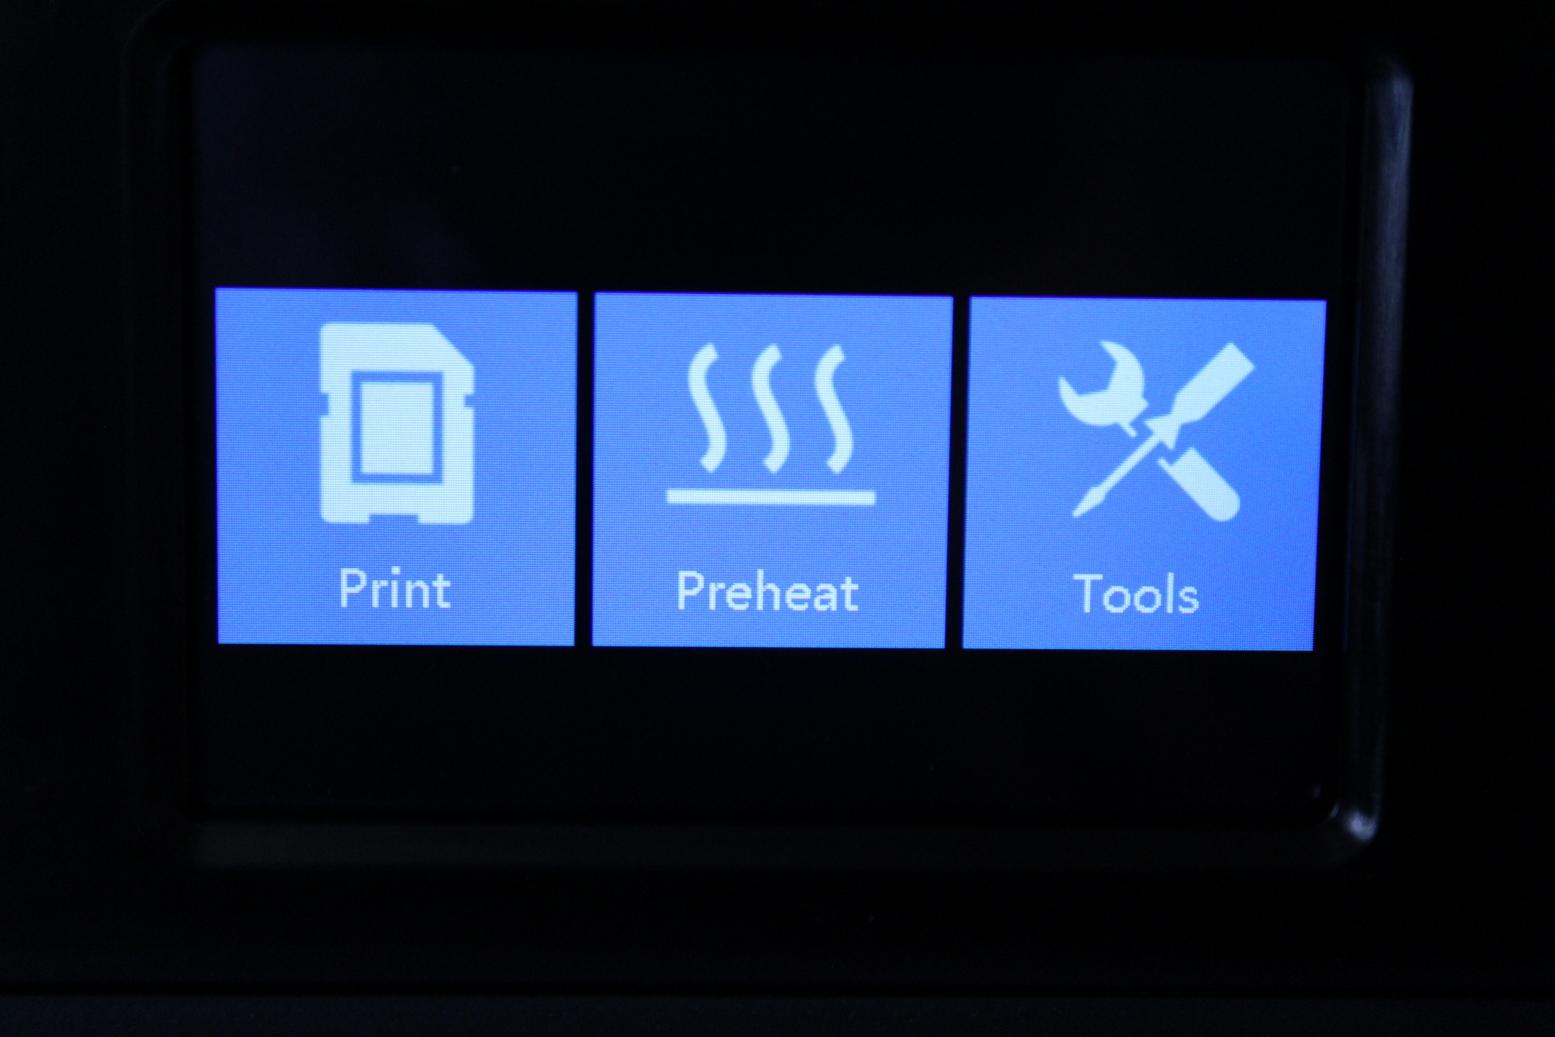 FlashForge-Creator-Pro-2-Touchscreen-Interface-11